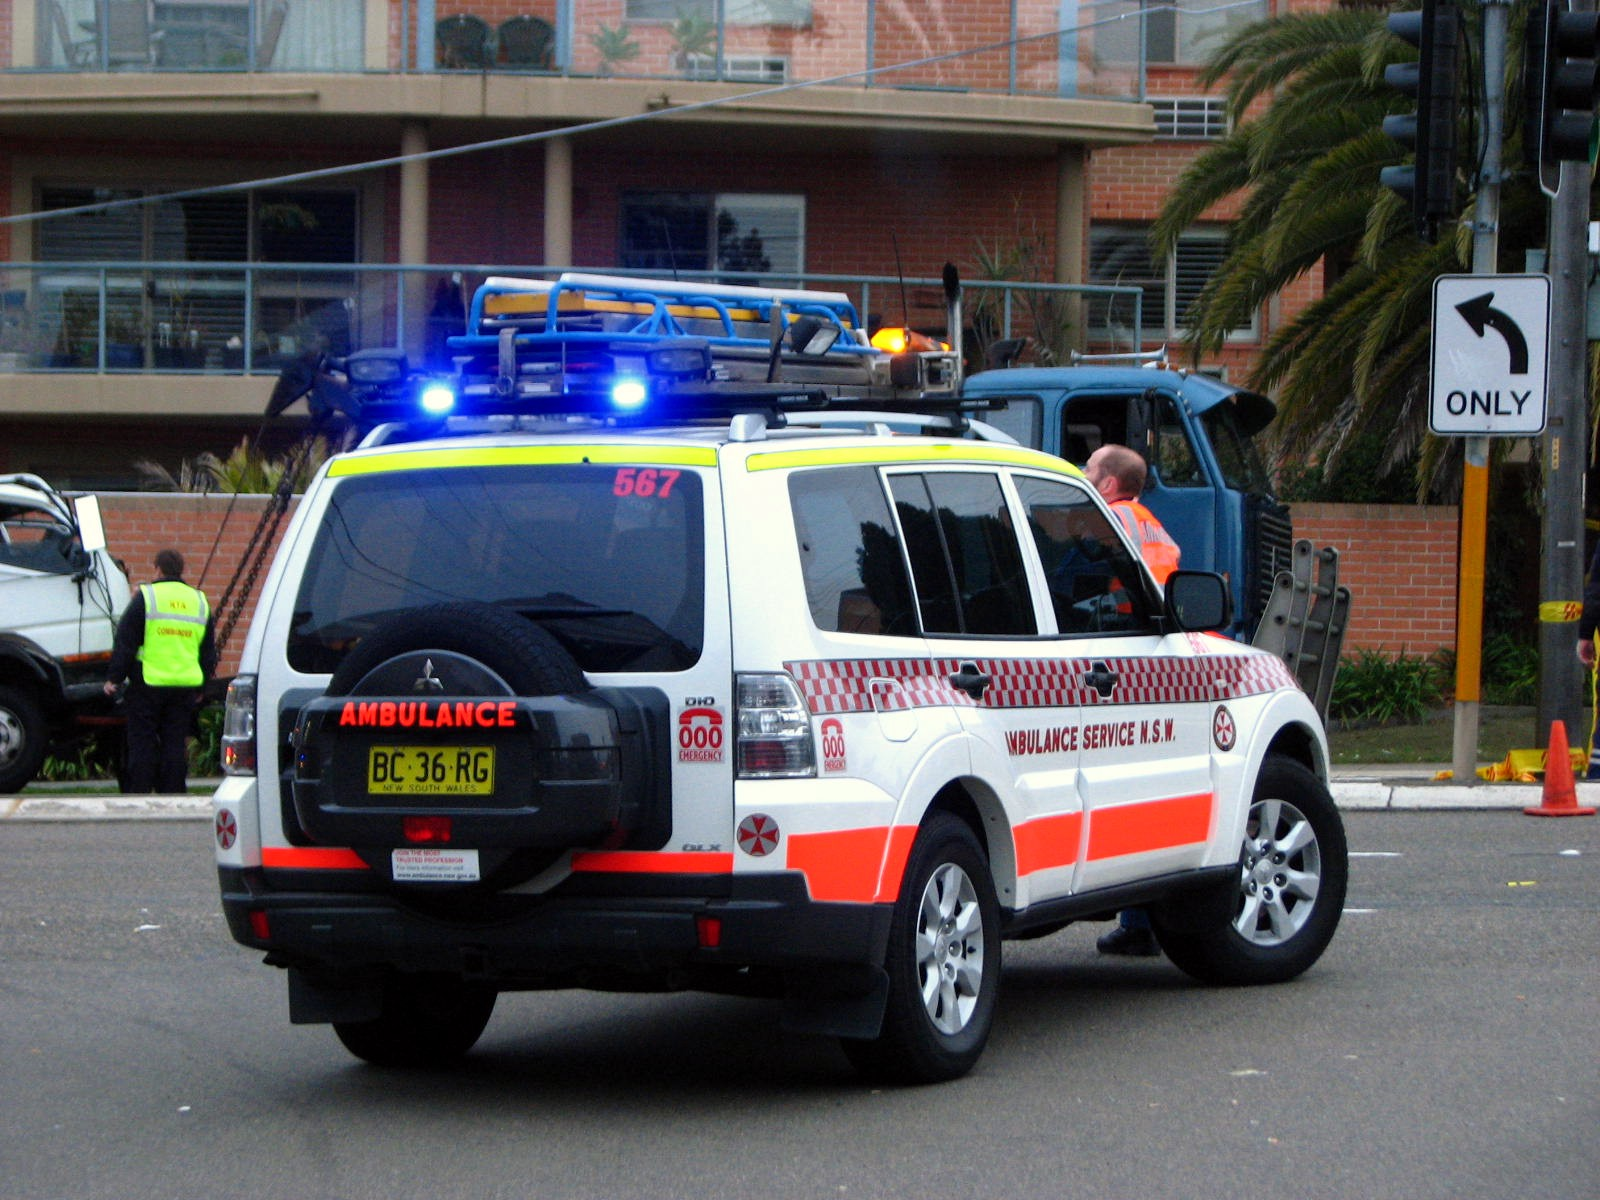 File:Ambulance NSW Mitsubishi Pajero Di-D Paramedic vehicle - Flickr - Highway Patrol Images.jpg ...